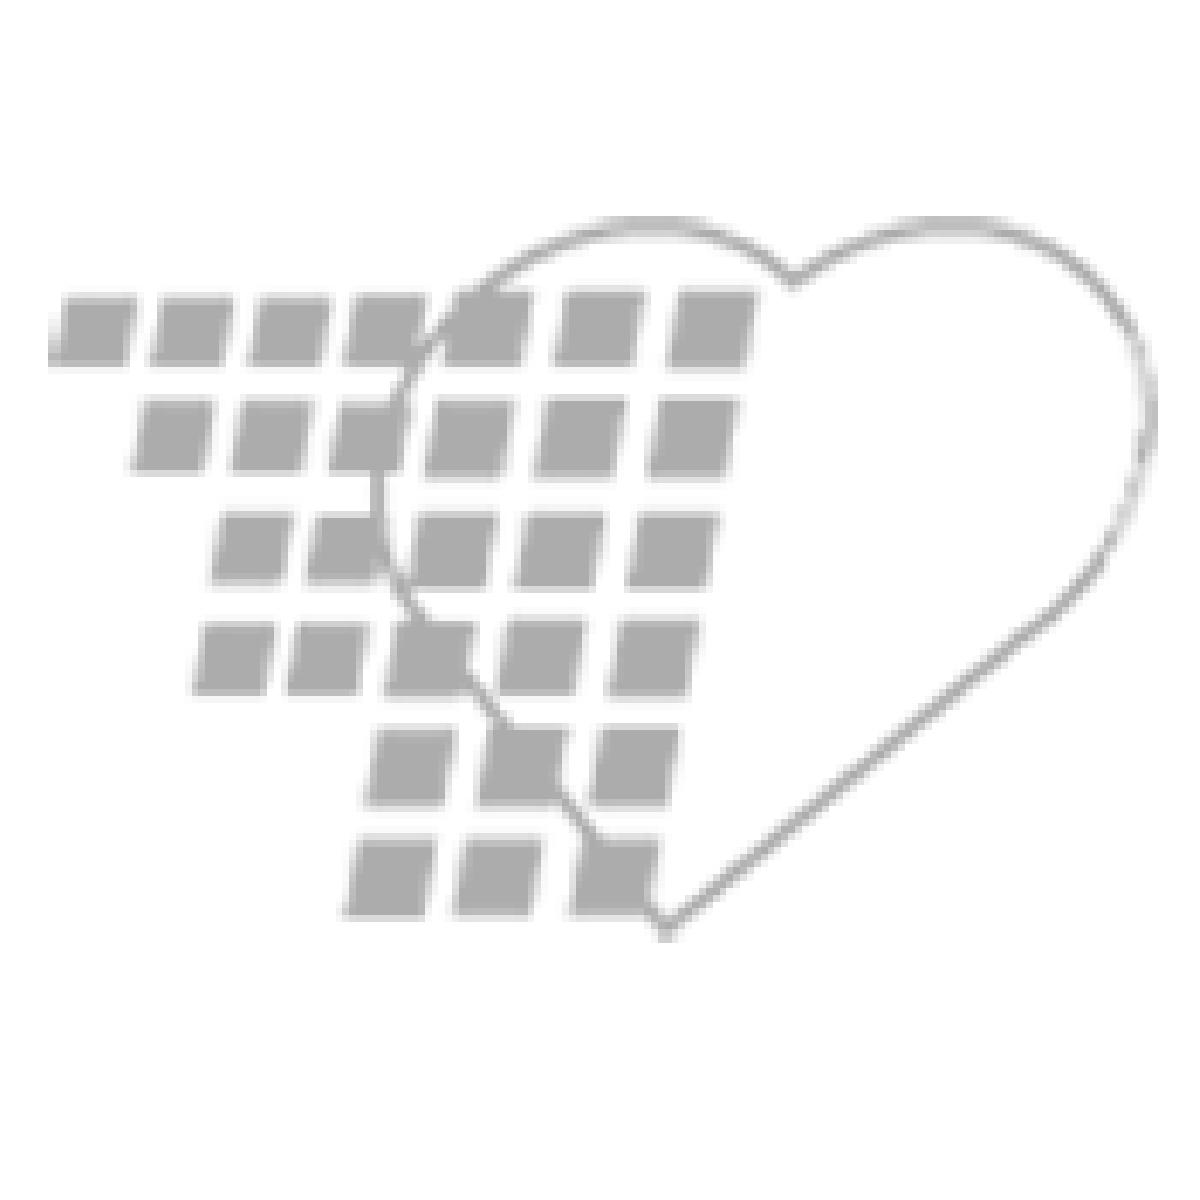 02-80-661 Proscope™ Single Head Teaching Stethoscope